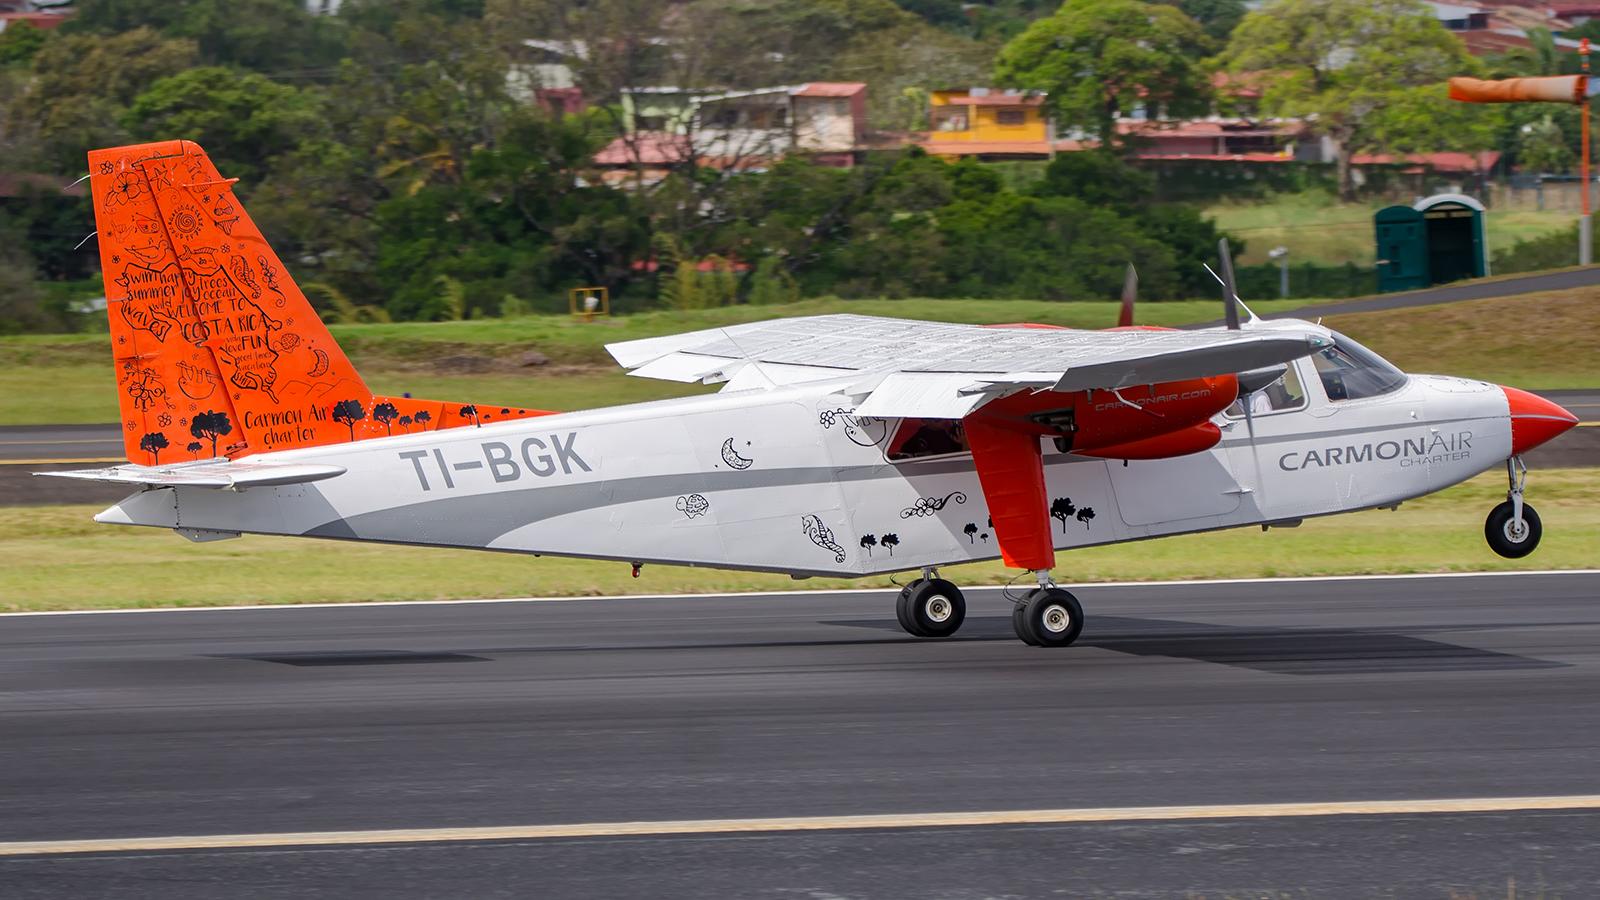 Click image for larger version.  Name:CarmonaAir_TI-BGK_15JAN18_1600_34sBeh.jpg Views:24 Size:929.8 KB ID:13150